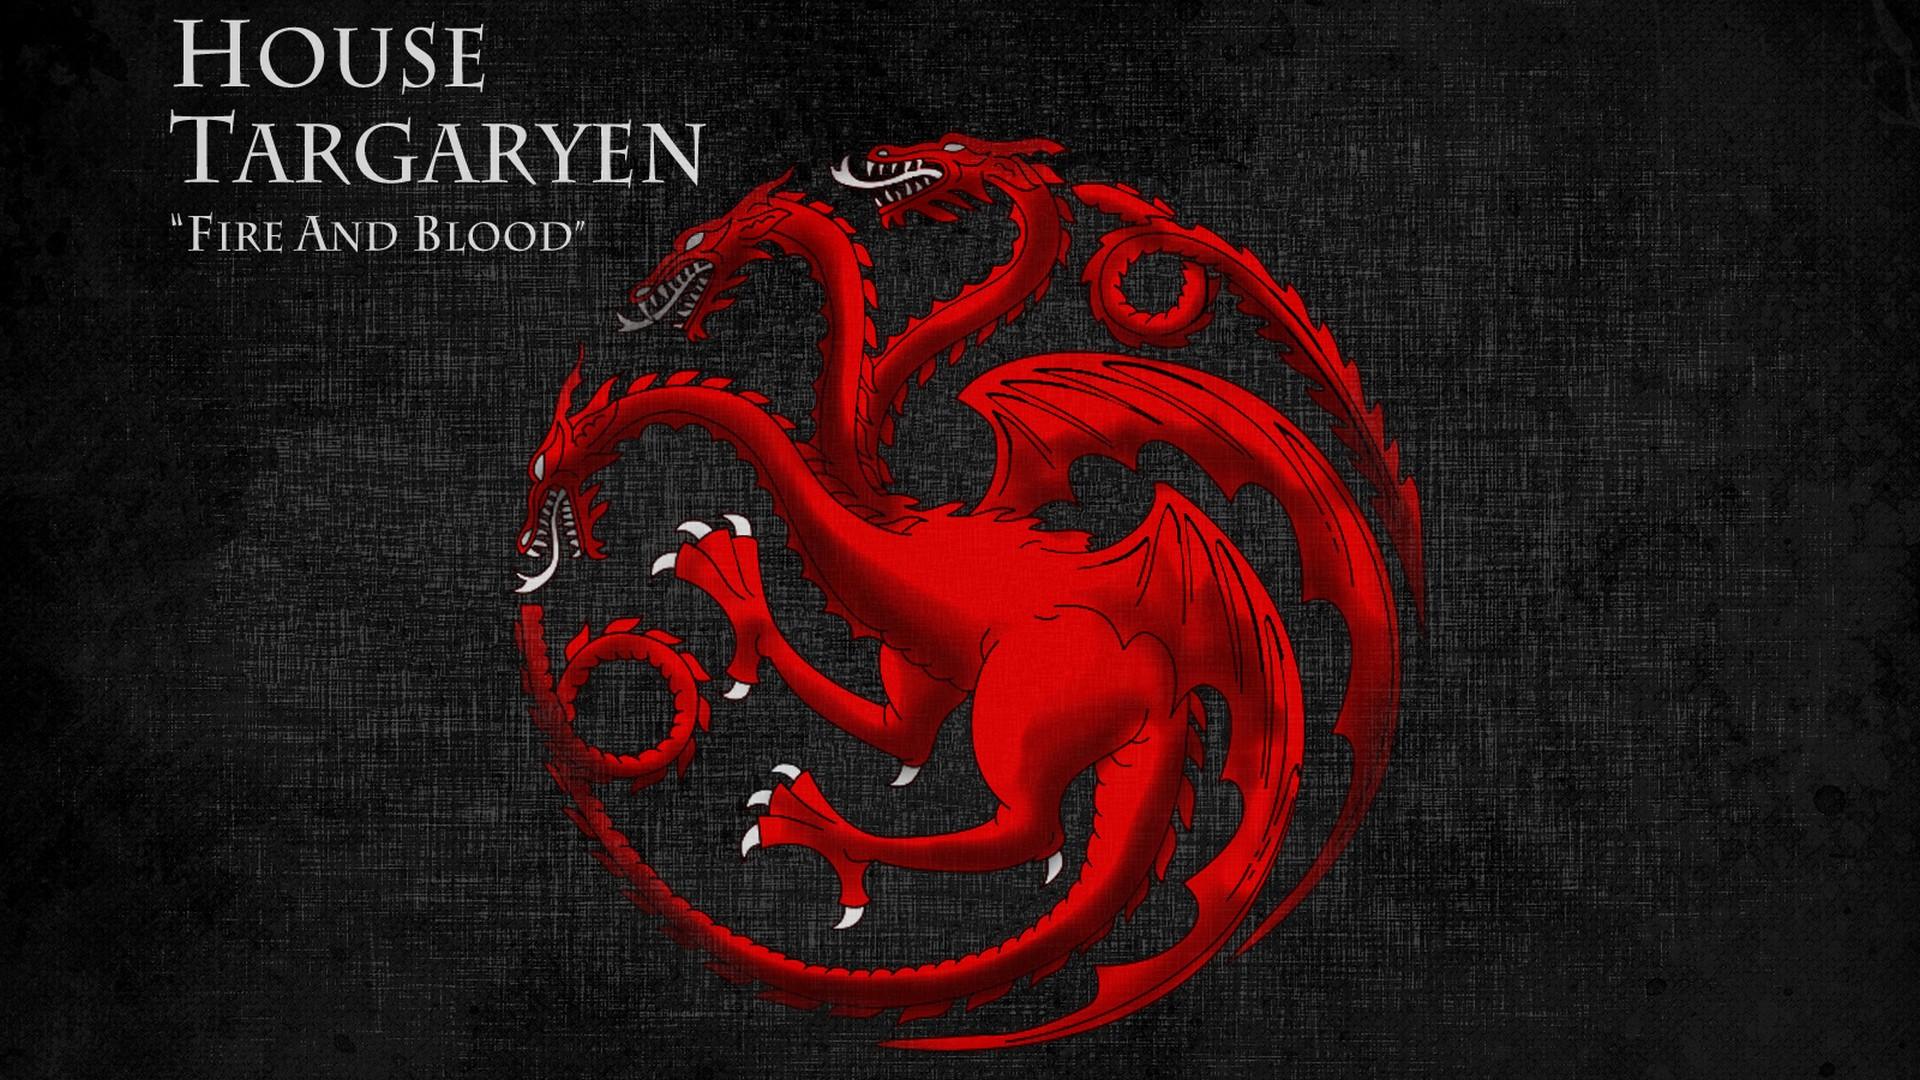 House Targaryen Game Of Thrones Wallpaper Hd With High-resolution - Game Of Thrones Targaryen High Definition - HD Wallpaper